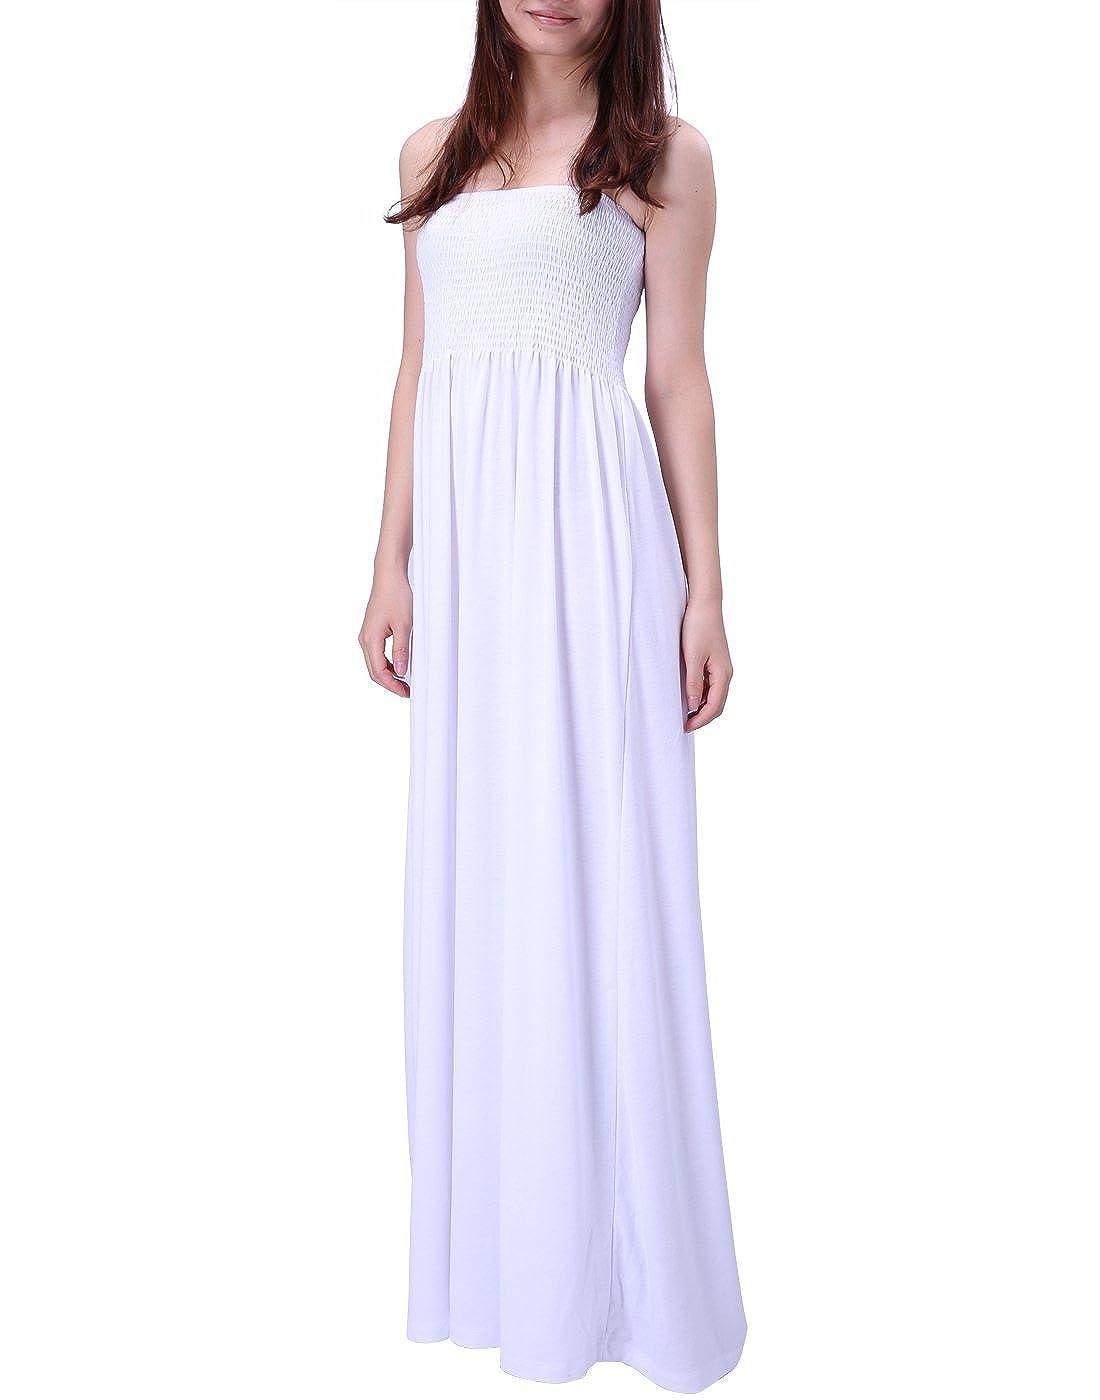 487c12d3e17 HDE Women s Strapless Maxi Dress Plus Size Tube Top Long Skirt ...